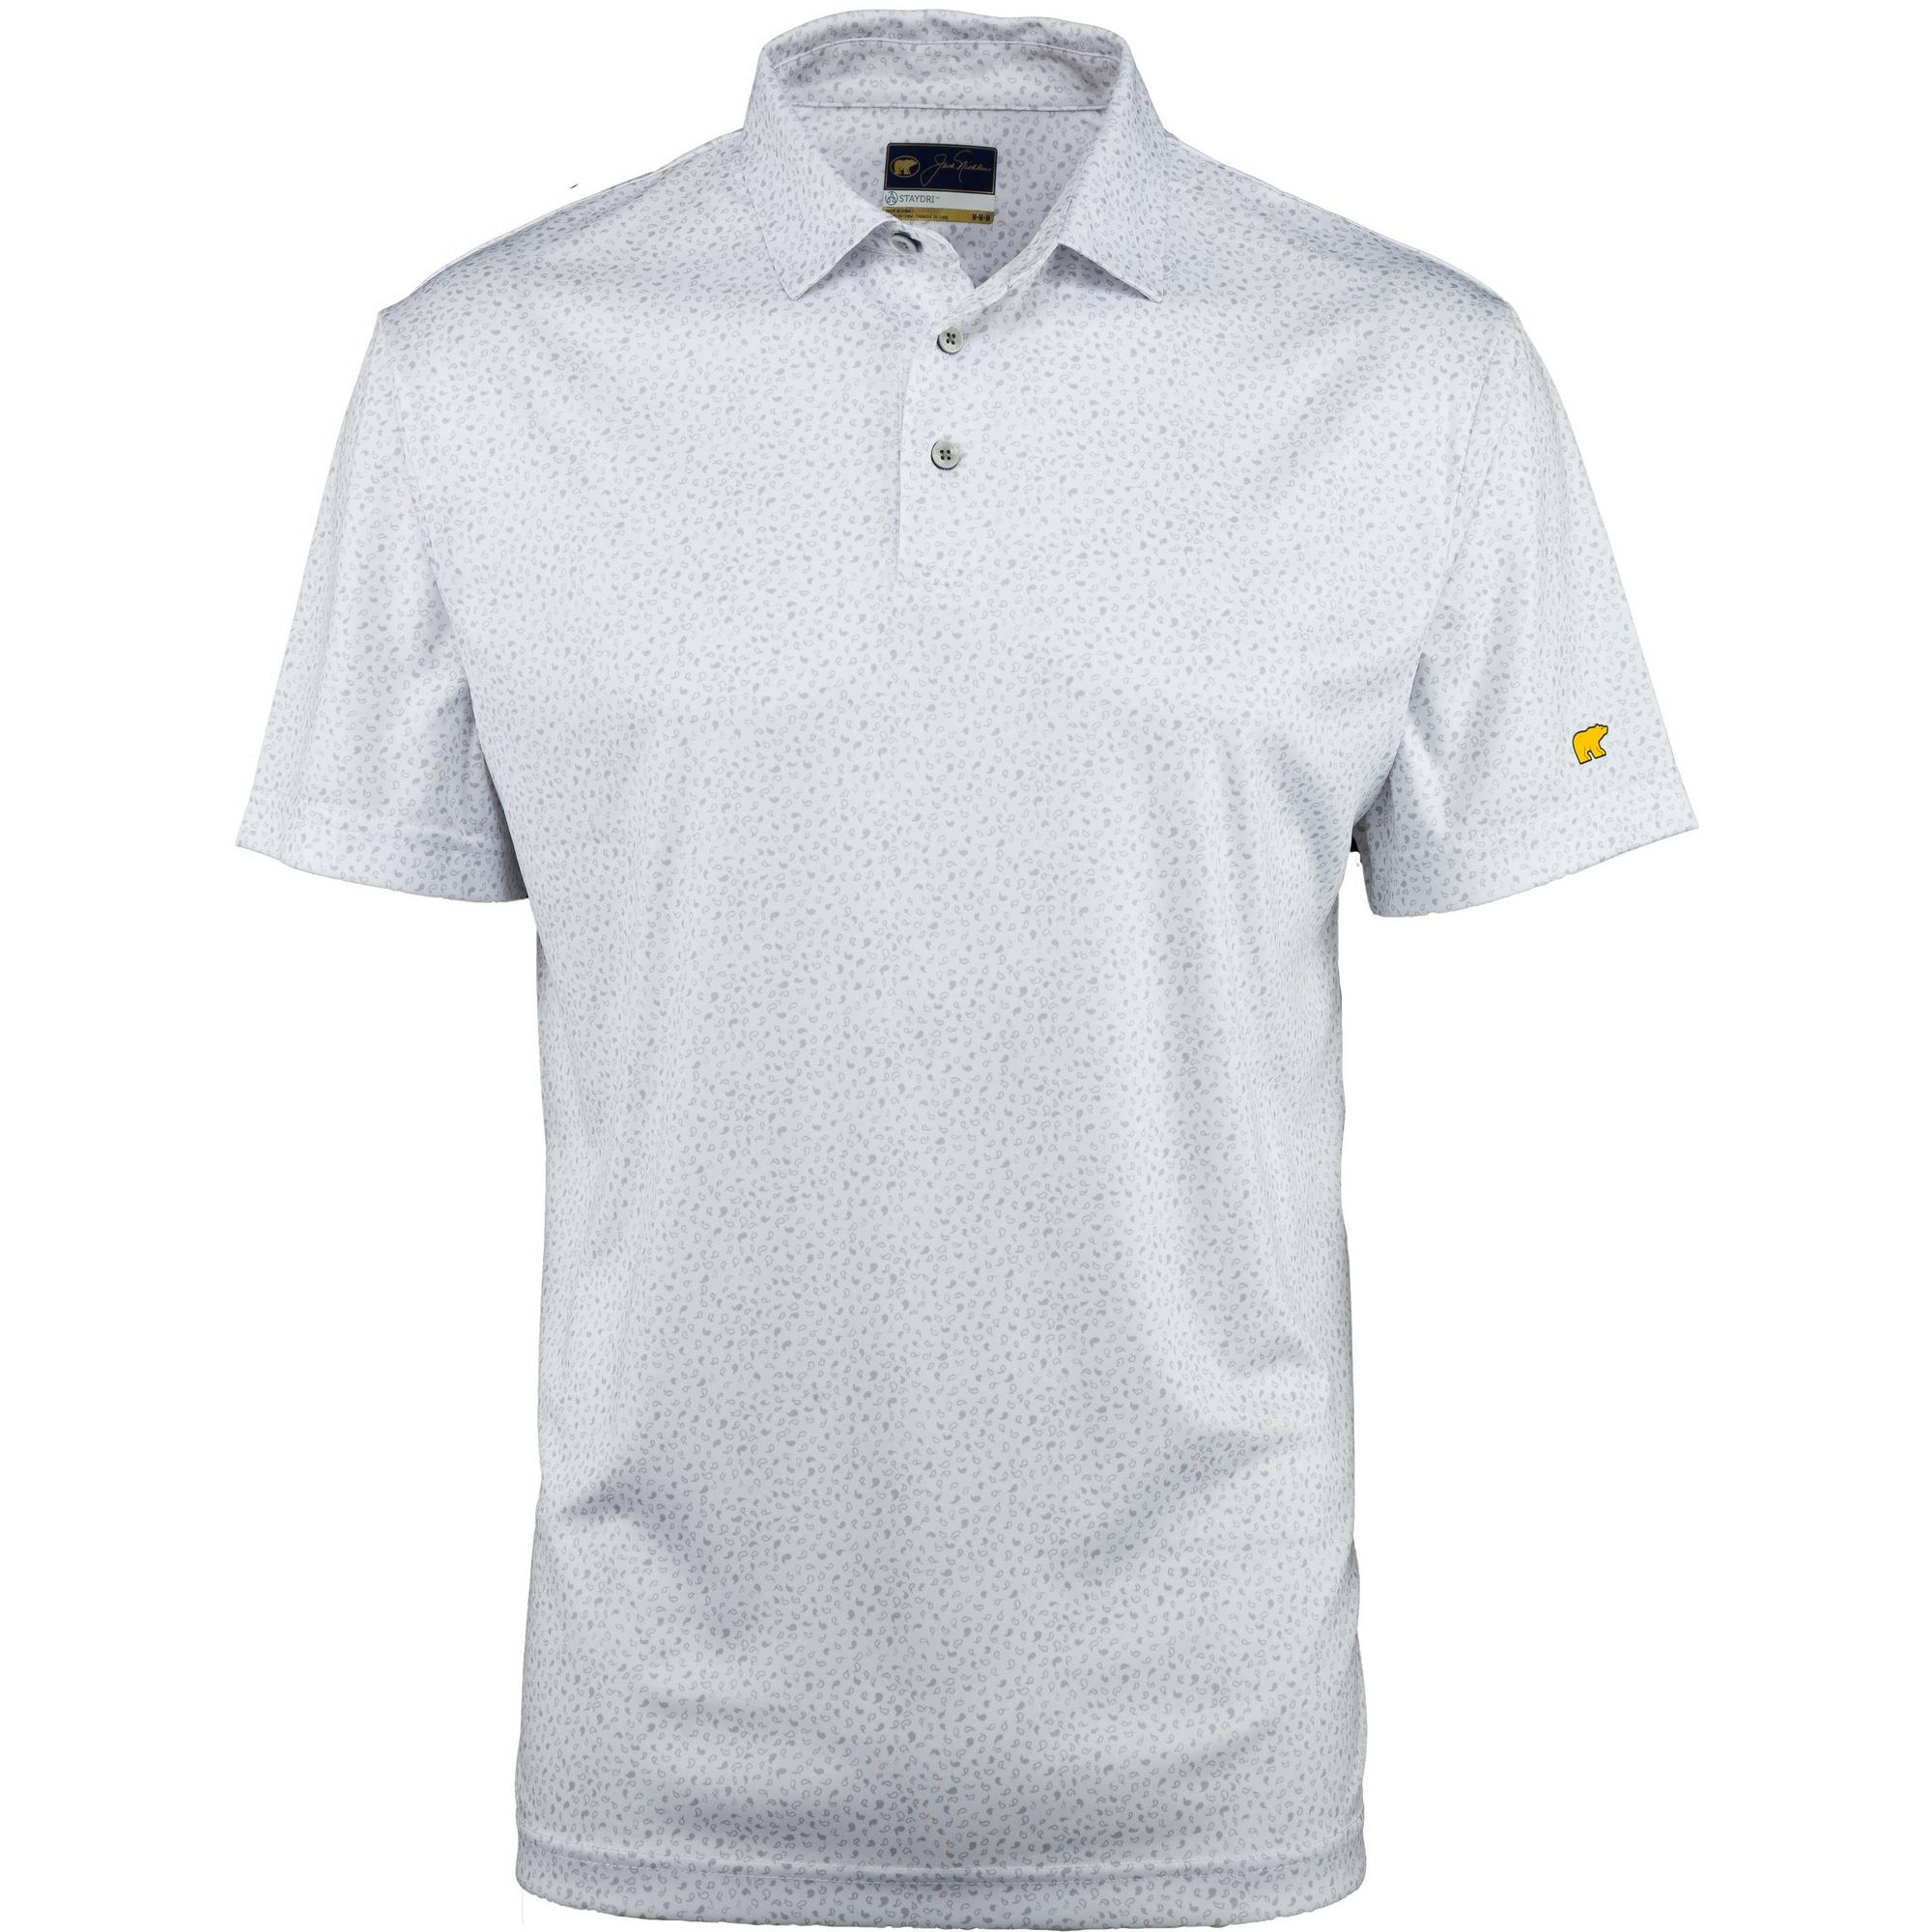 Men's Mini Paisley Short Sleeve Shirt